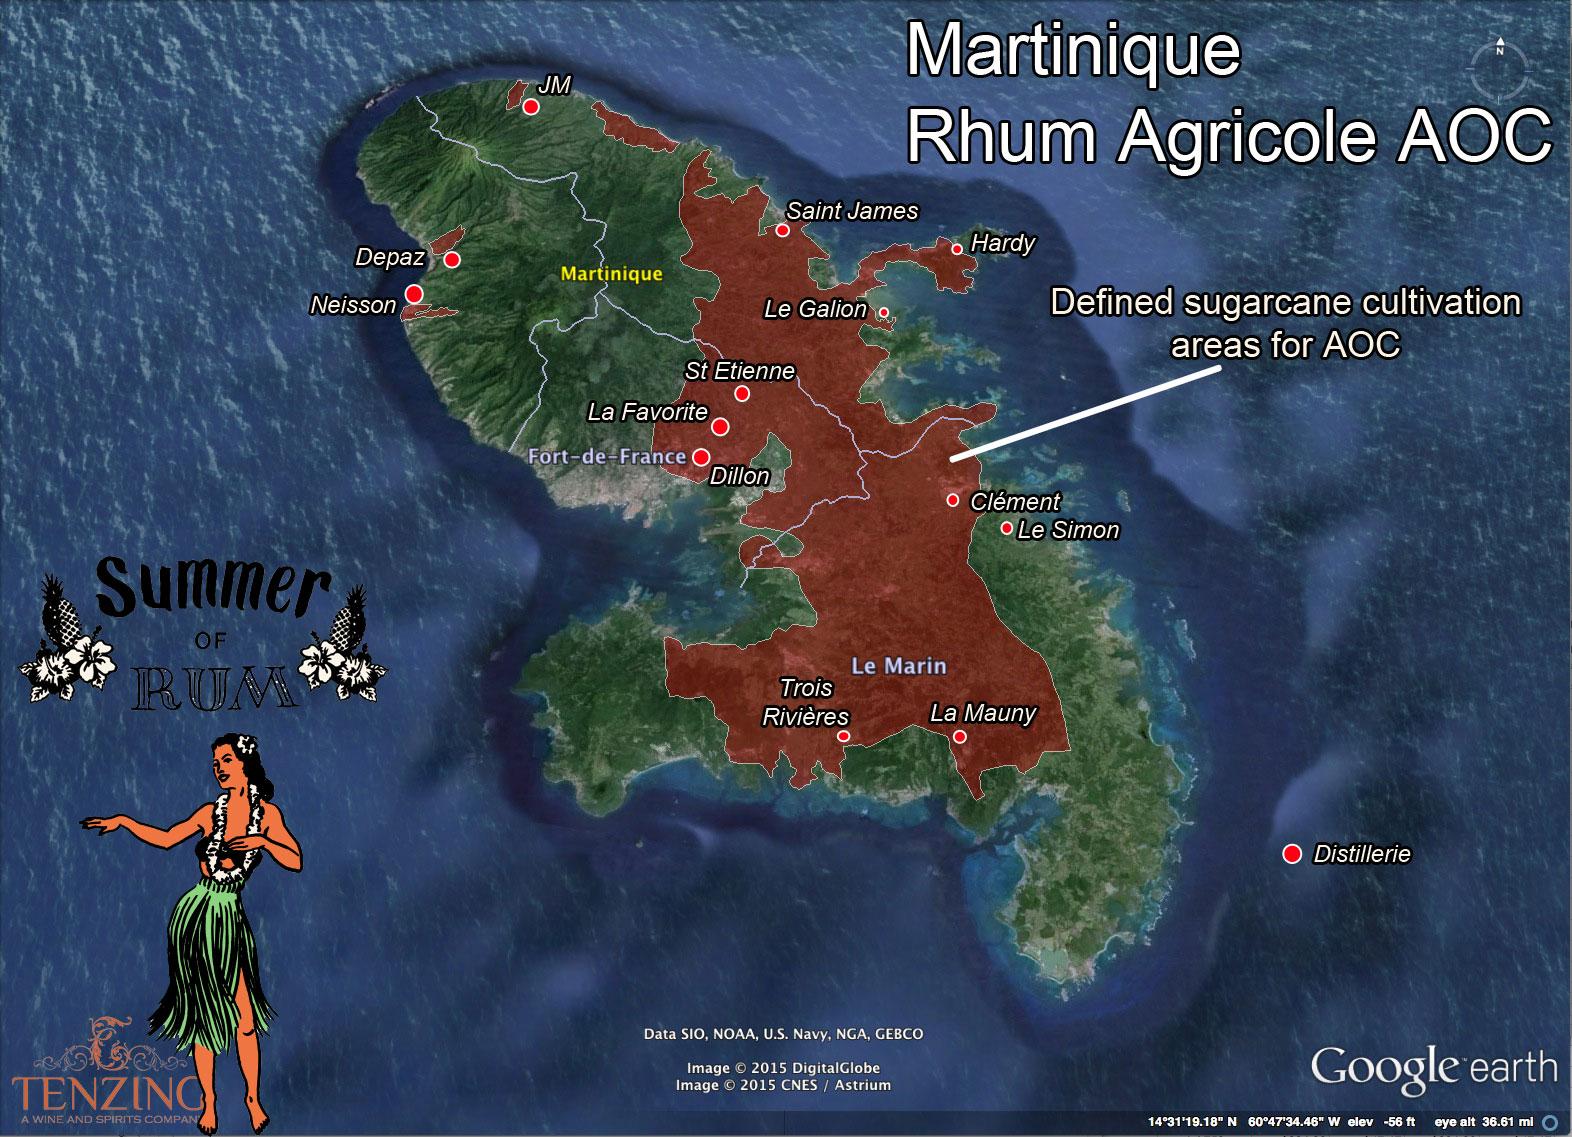 Map Of Martinique Rhum Agricole Aoc And Distilleries Summerofrum